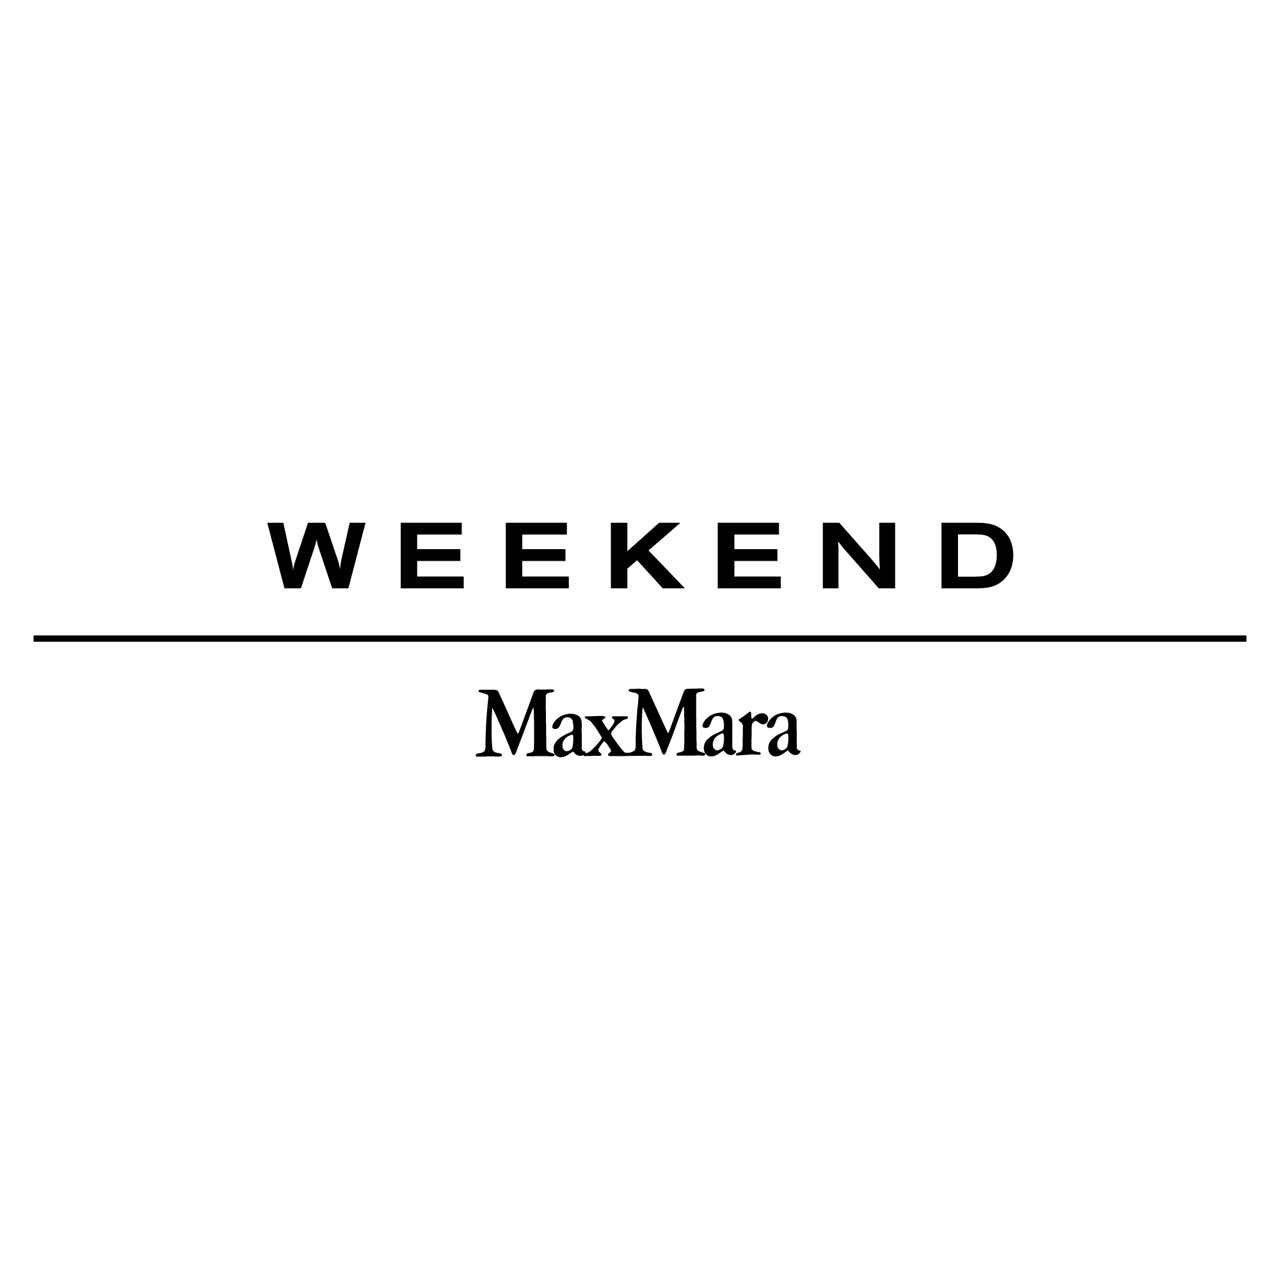 Weekend Max Mara - Metrotown, BC V5H 4M1 - (604)257-2381 | ShowMeLocal.com